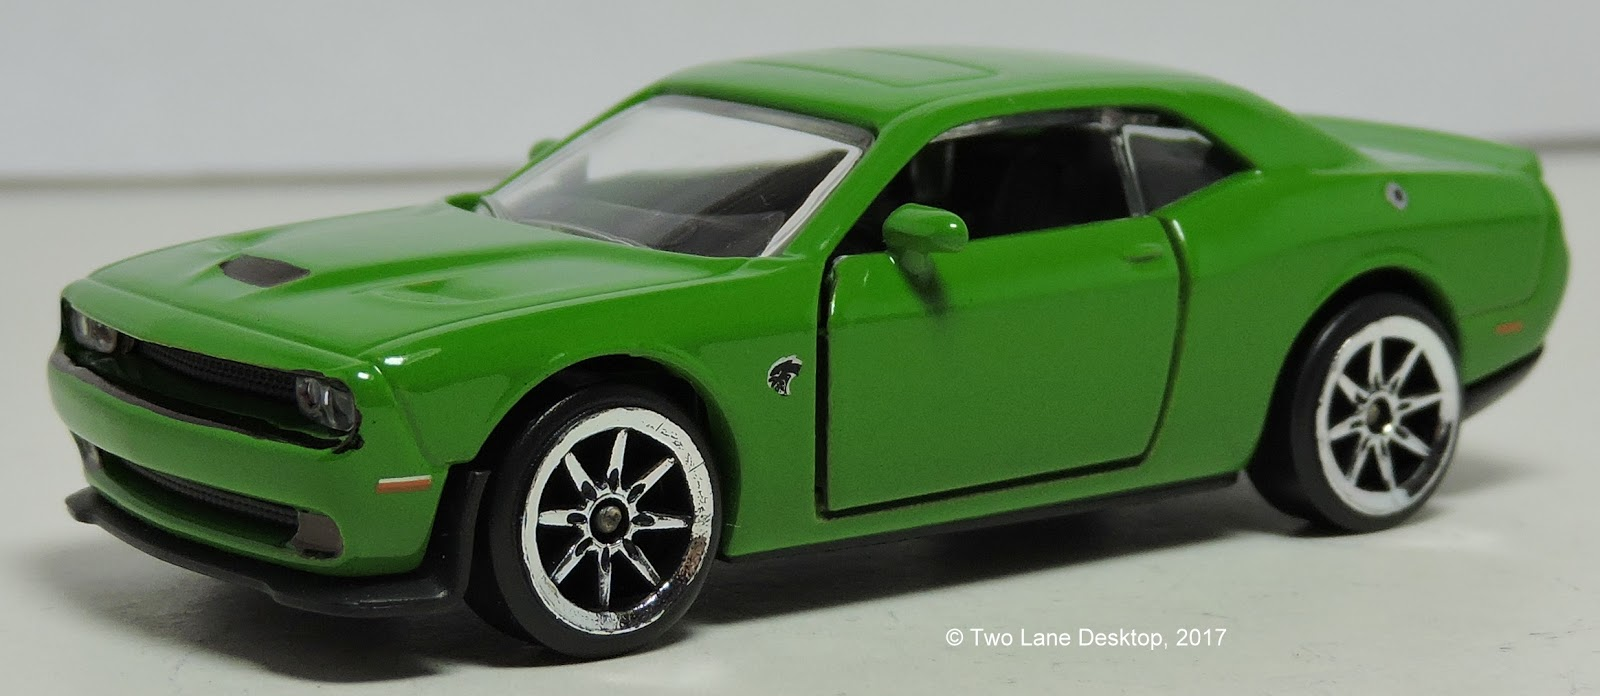 2015 Sublime Green Dodge Challenger Decals Autos Post